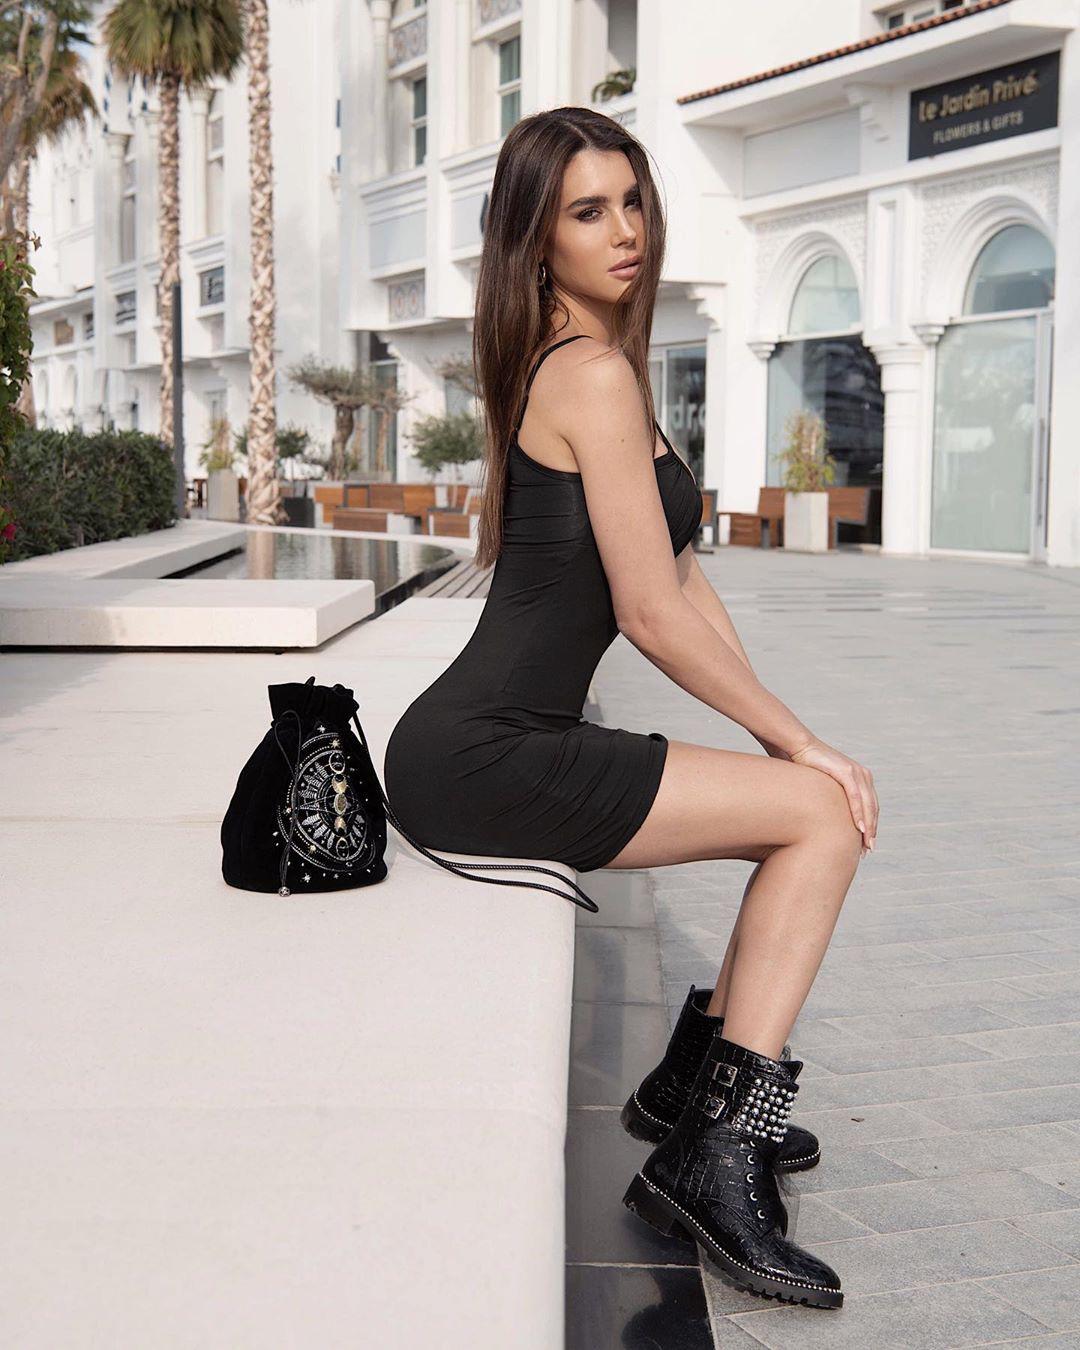 Silvia Caruso hot legs girls, hot legs, costumes designs